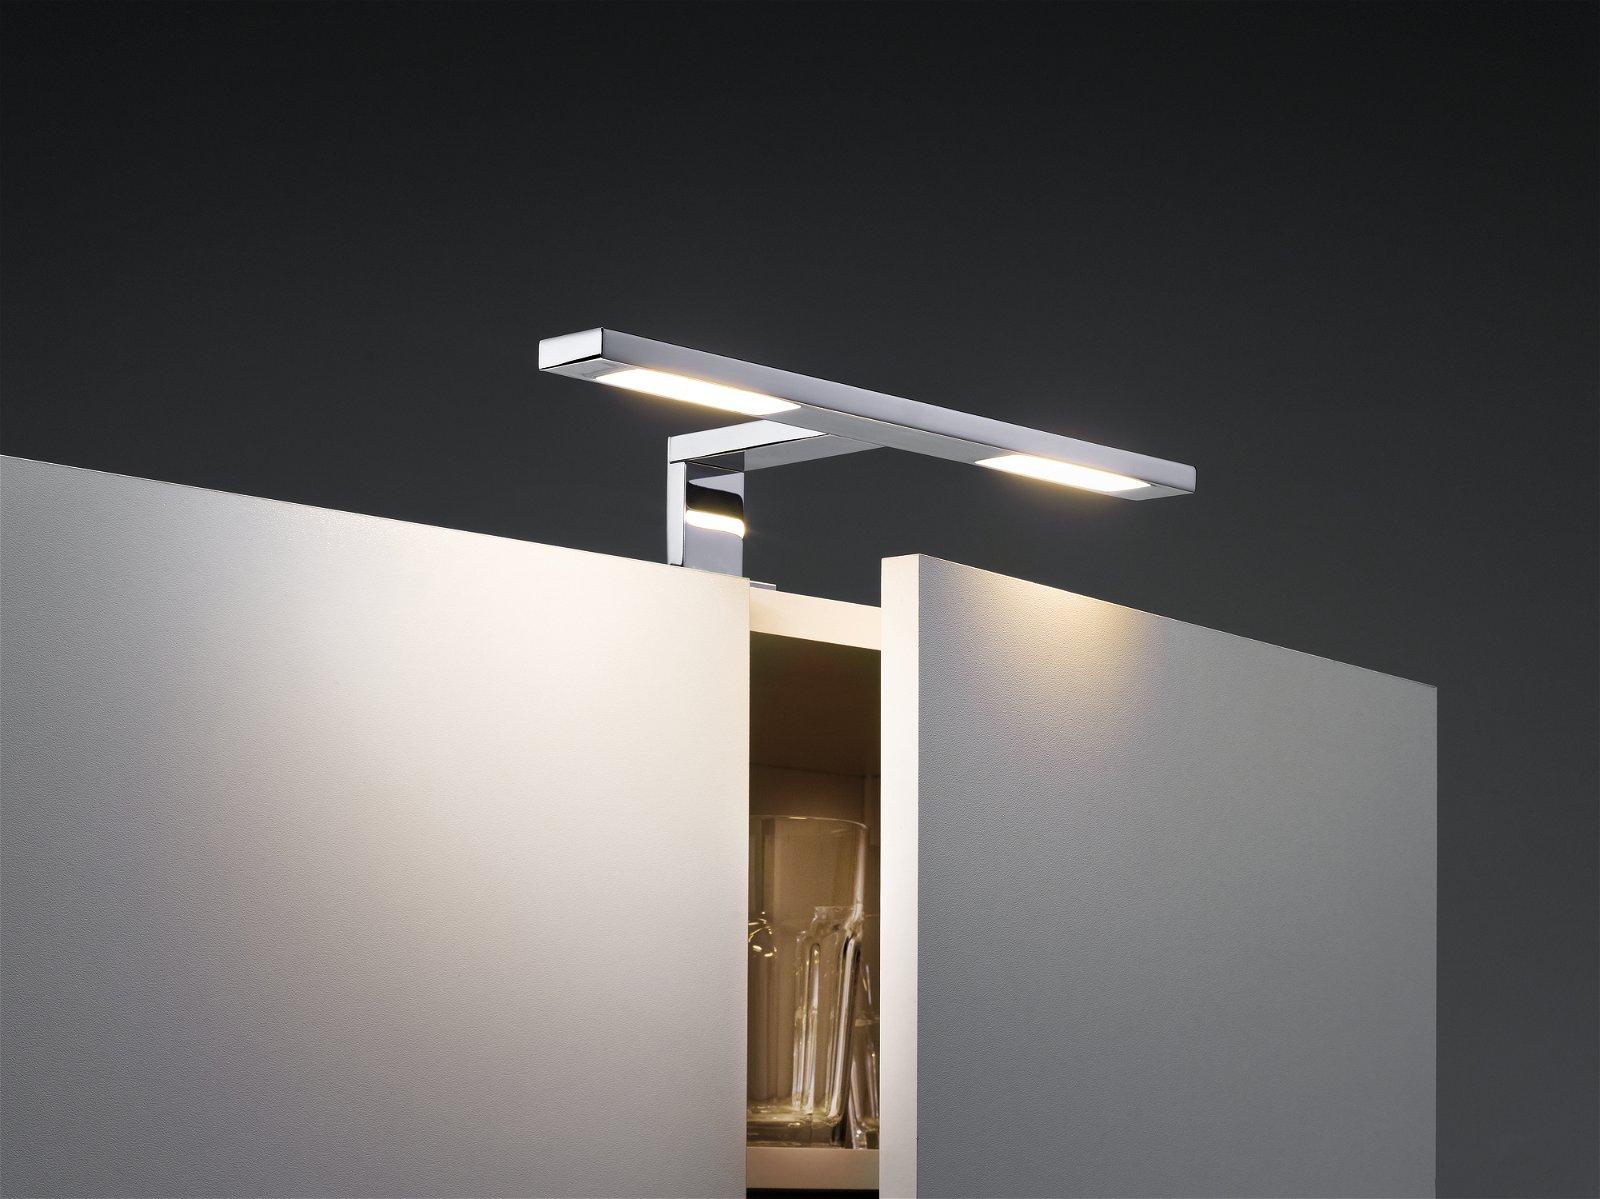 Galeria LED Spiegelleuchte Hook IP44 2700K 2x378lm 230V 2x3,2W Chrom